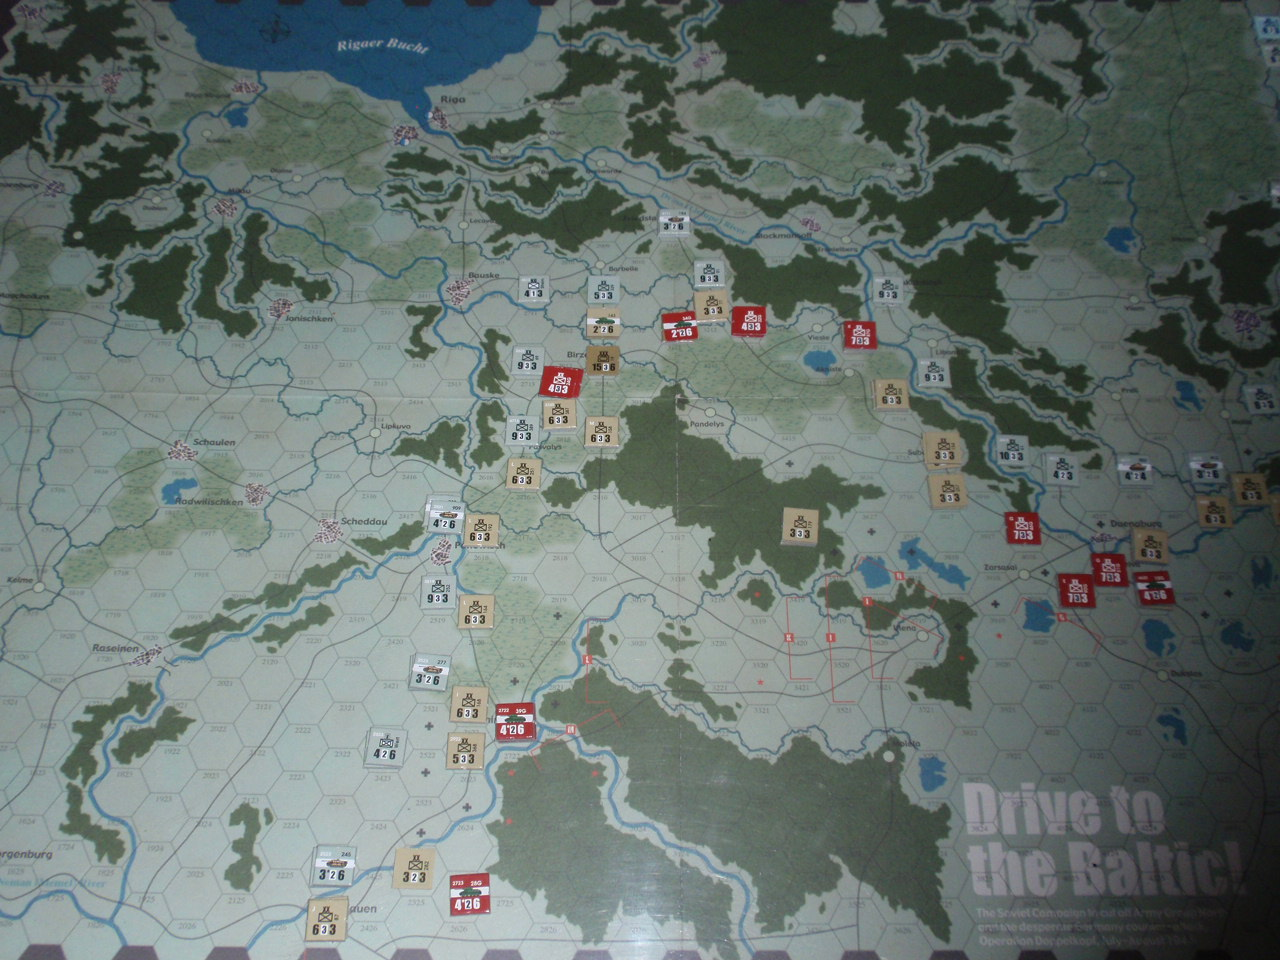 MIH/CMJ「Drive to the Baltic!」をソロプレイ①_b0162202_10324258.jpg